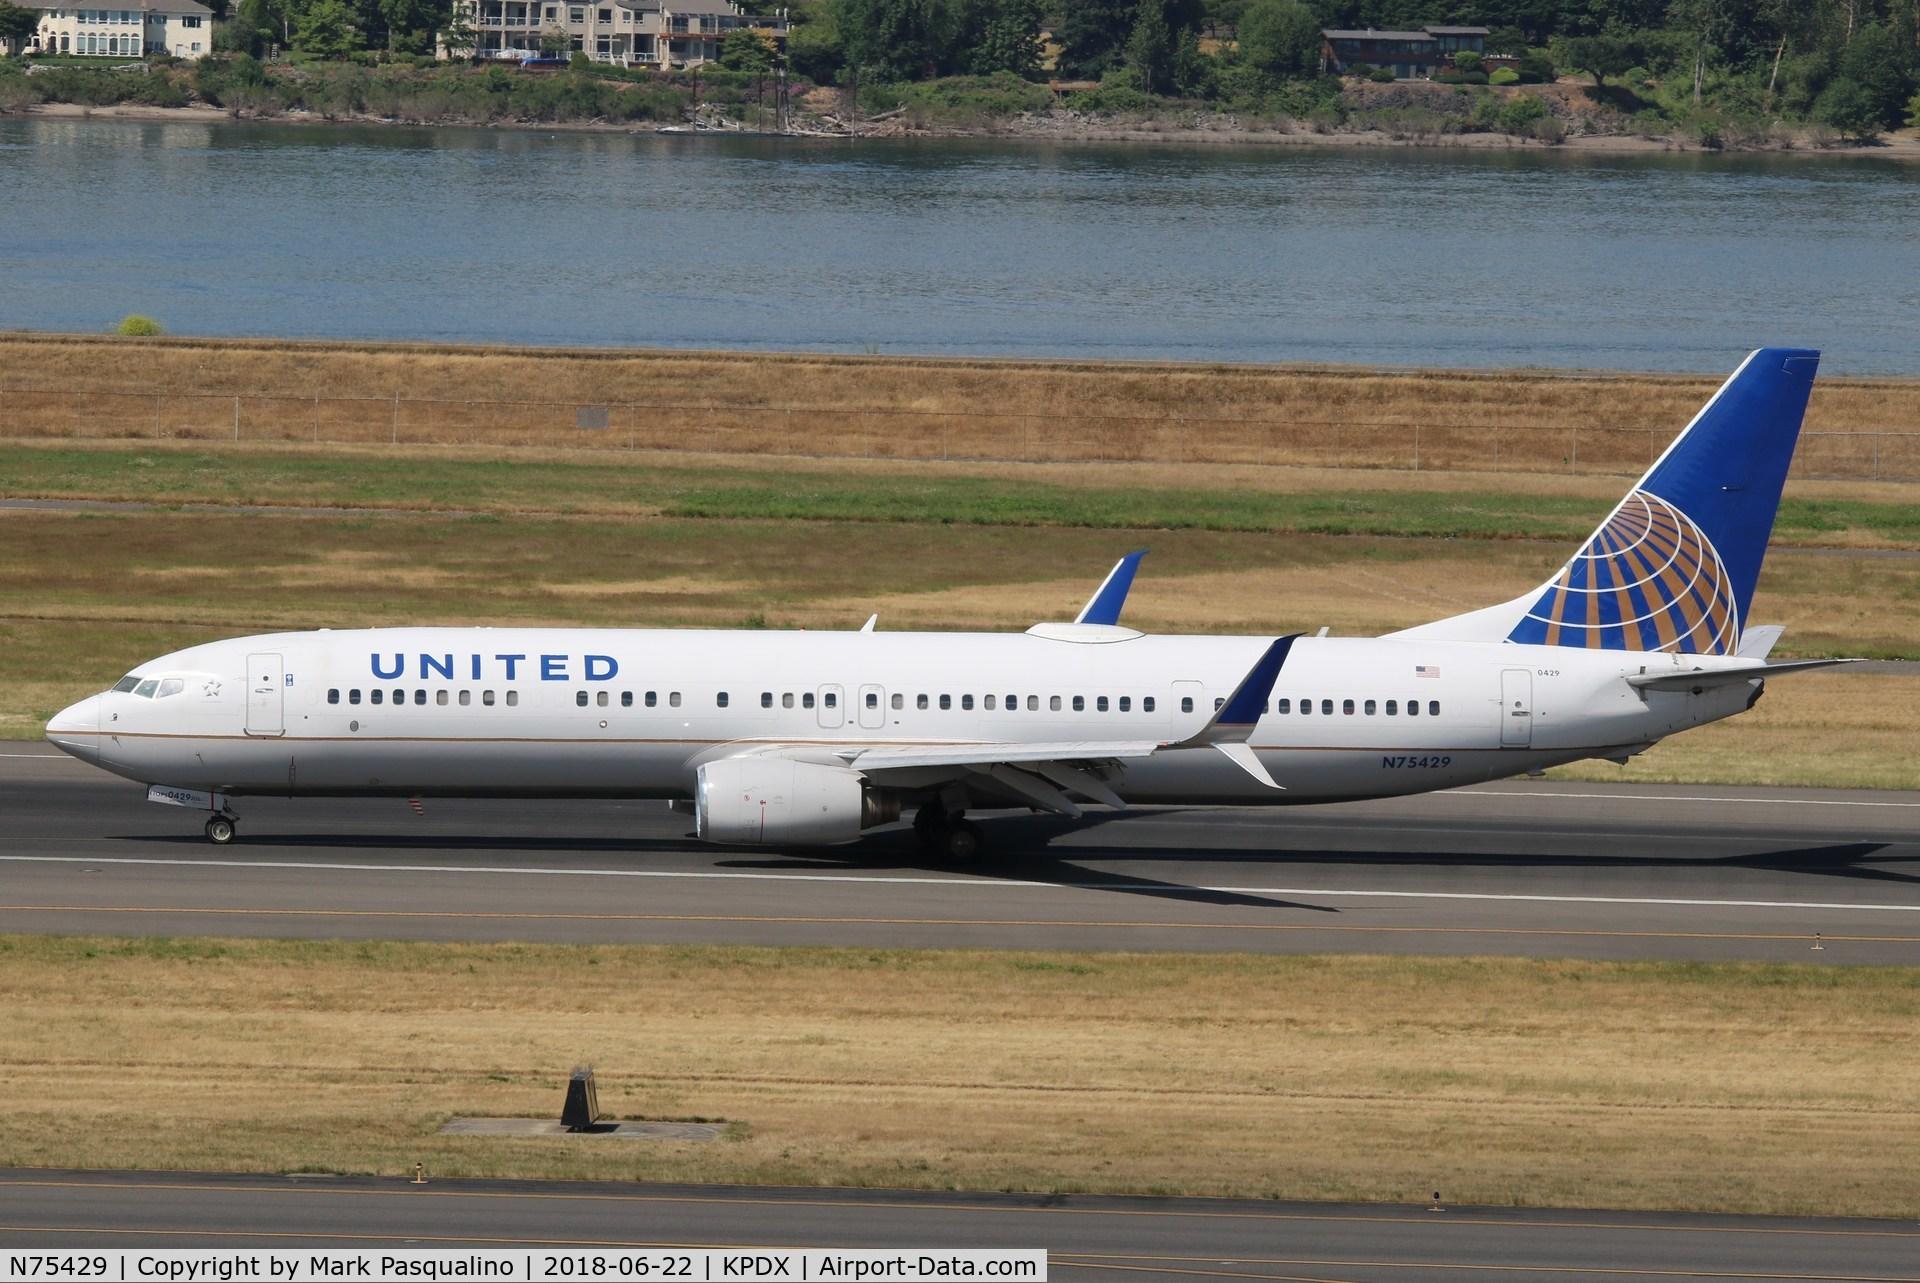 N75429, 2008 Boeing 737-924/ER C/N 30130, Boeing 737-900ER